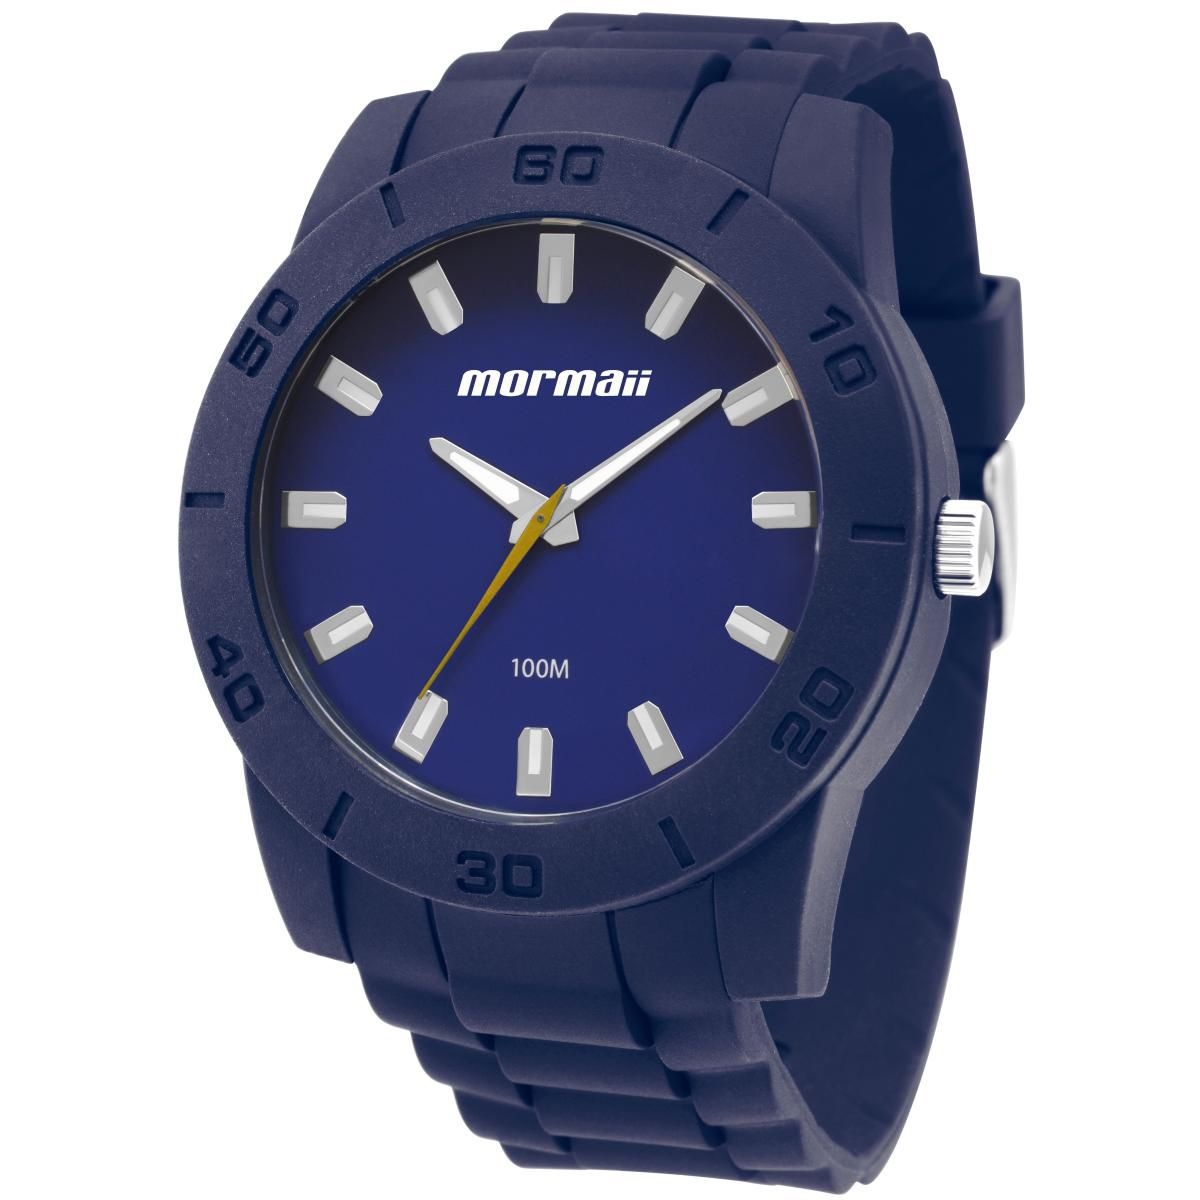 Relógio Masculino Mormaii  MOCRU2035AA/8A  45mm Silicone Azul